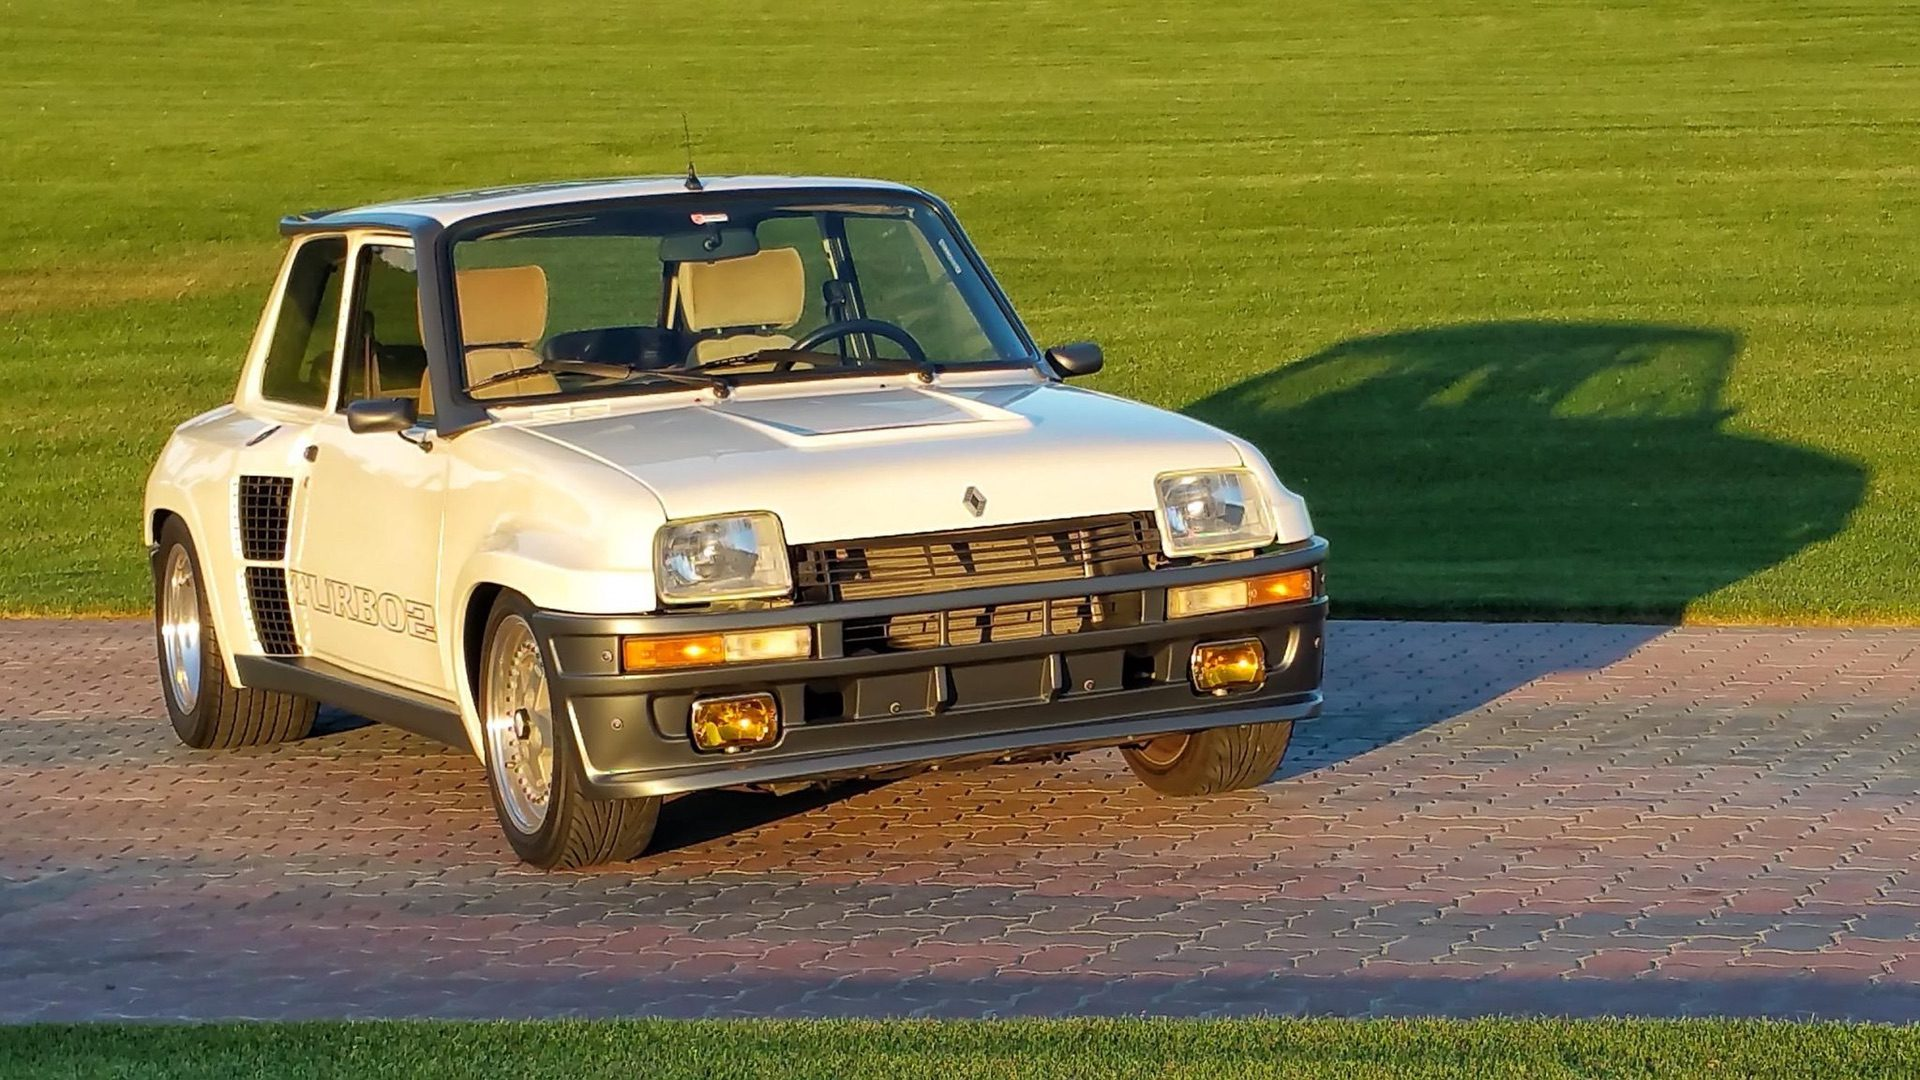 1985_Renault_R5_Turbo_2_rotary-0023